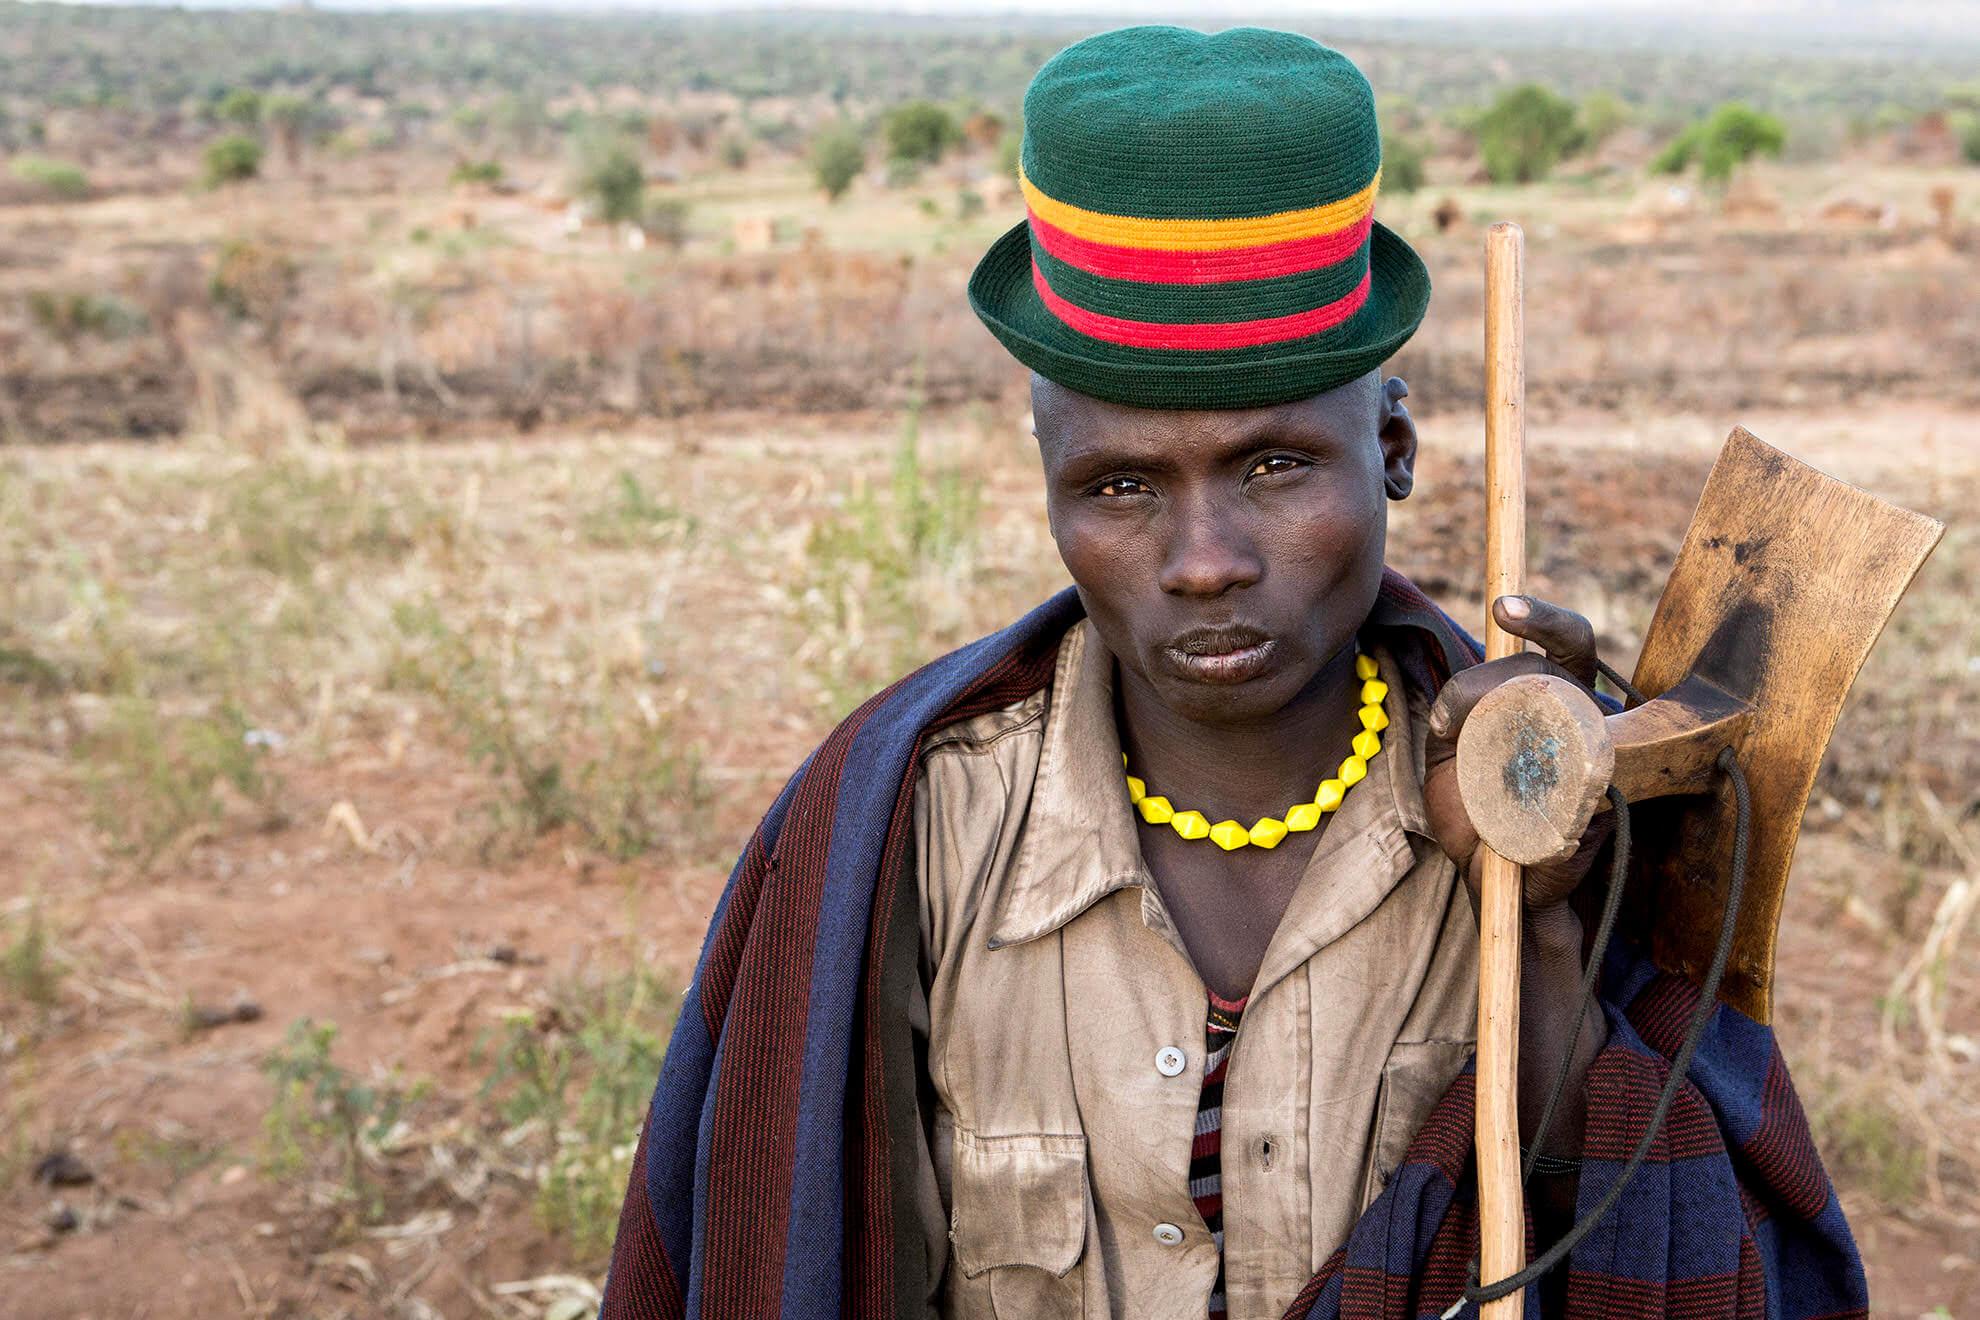 viaje uganda etnia karamajong